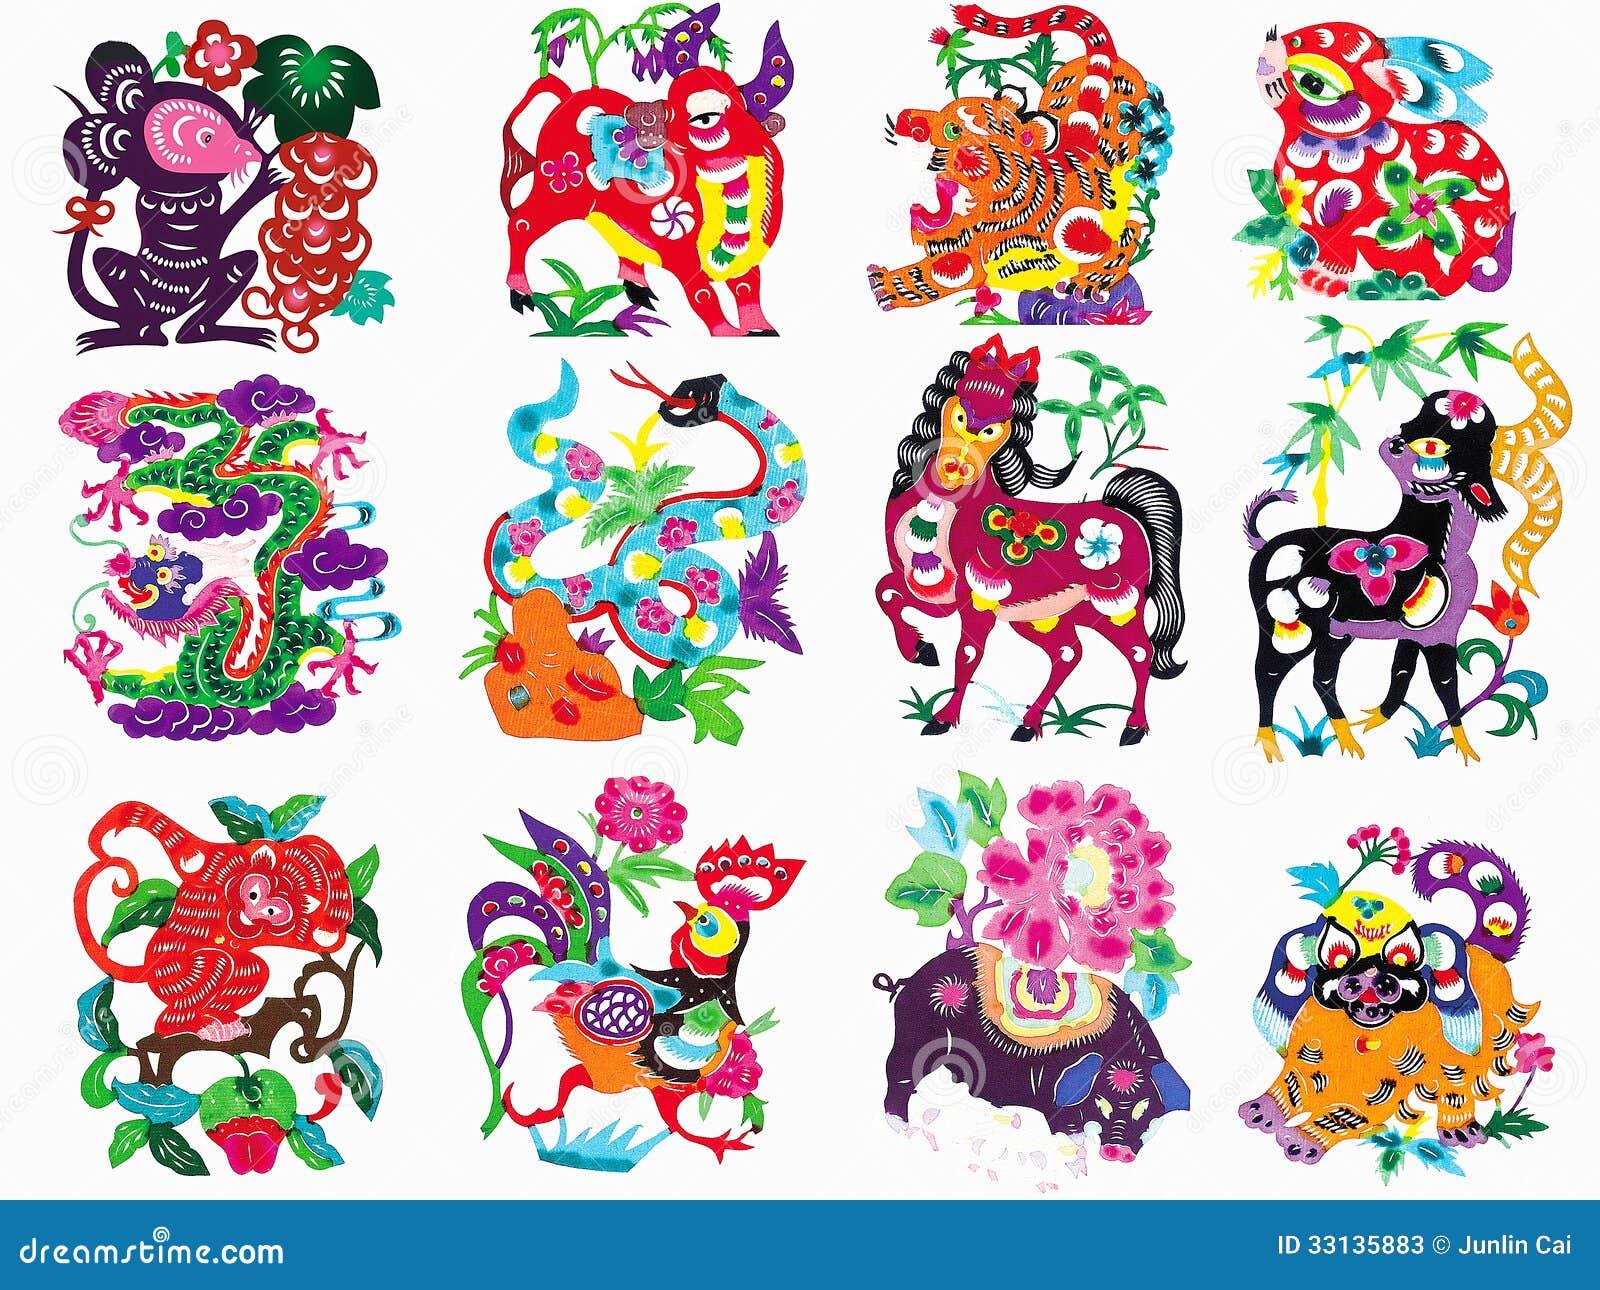 Chinese Zodiac Arts And Crafts